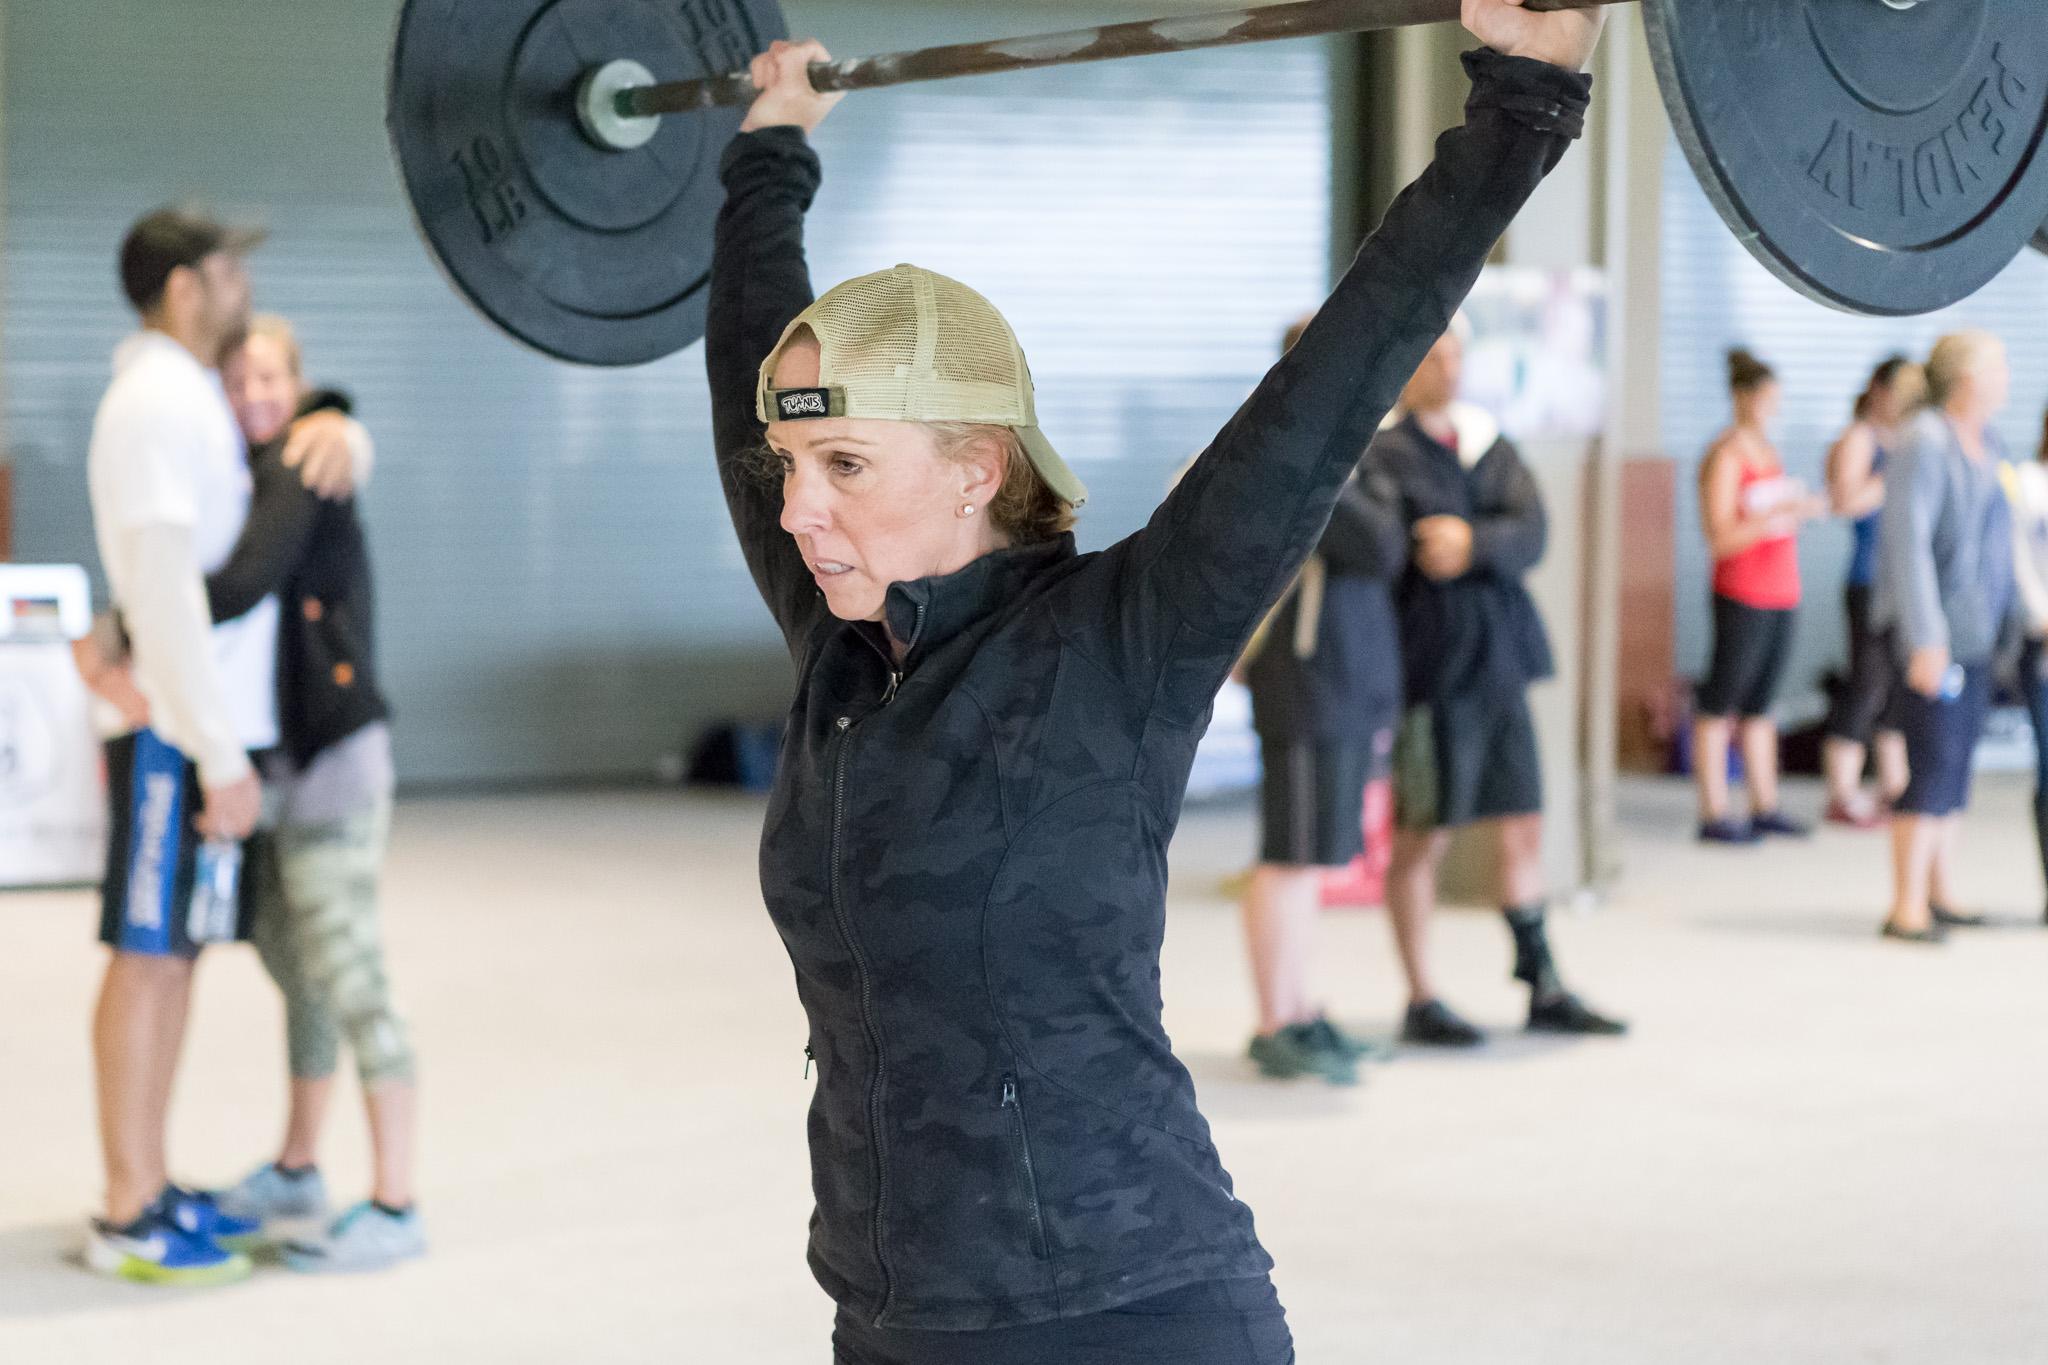 Kelly Stratton, Member, CrossFit S3